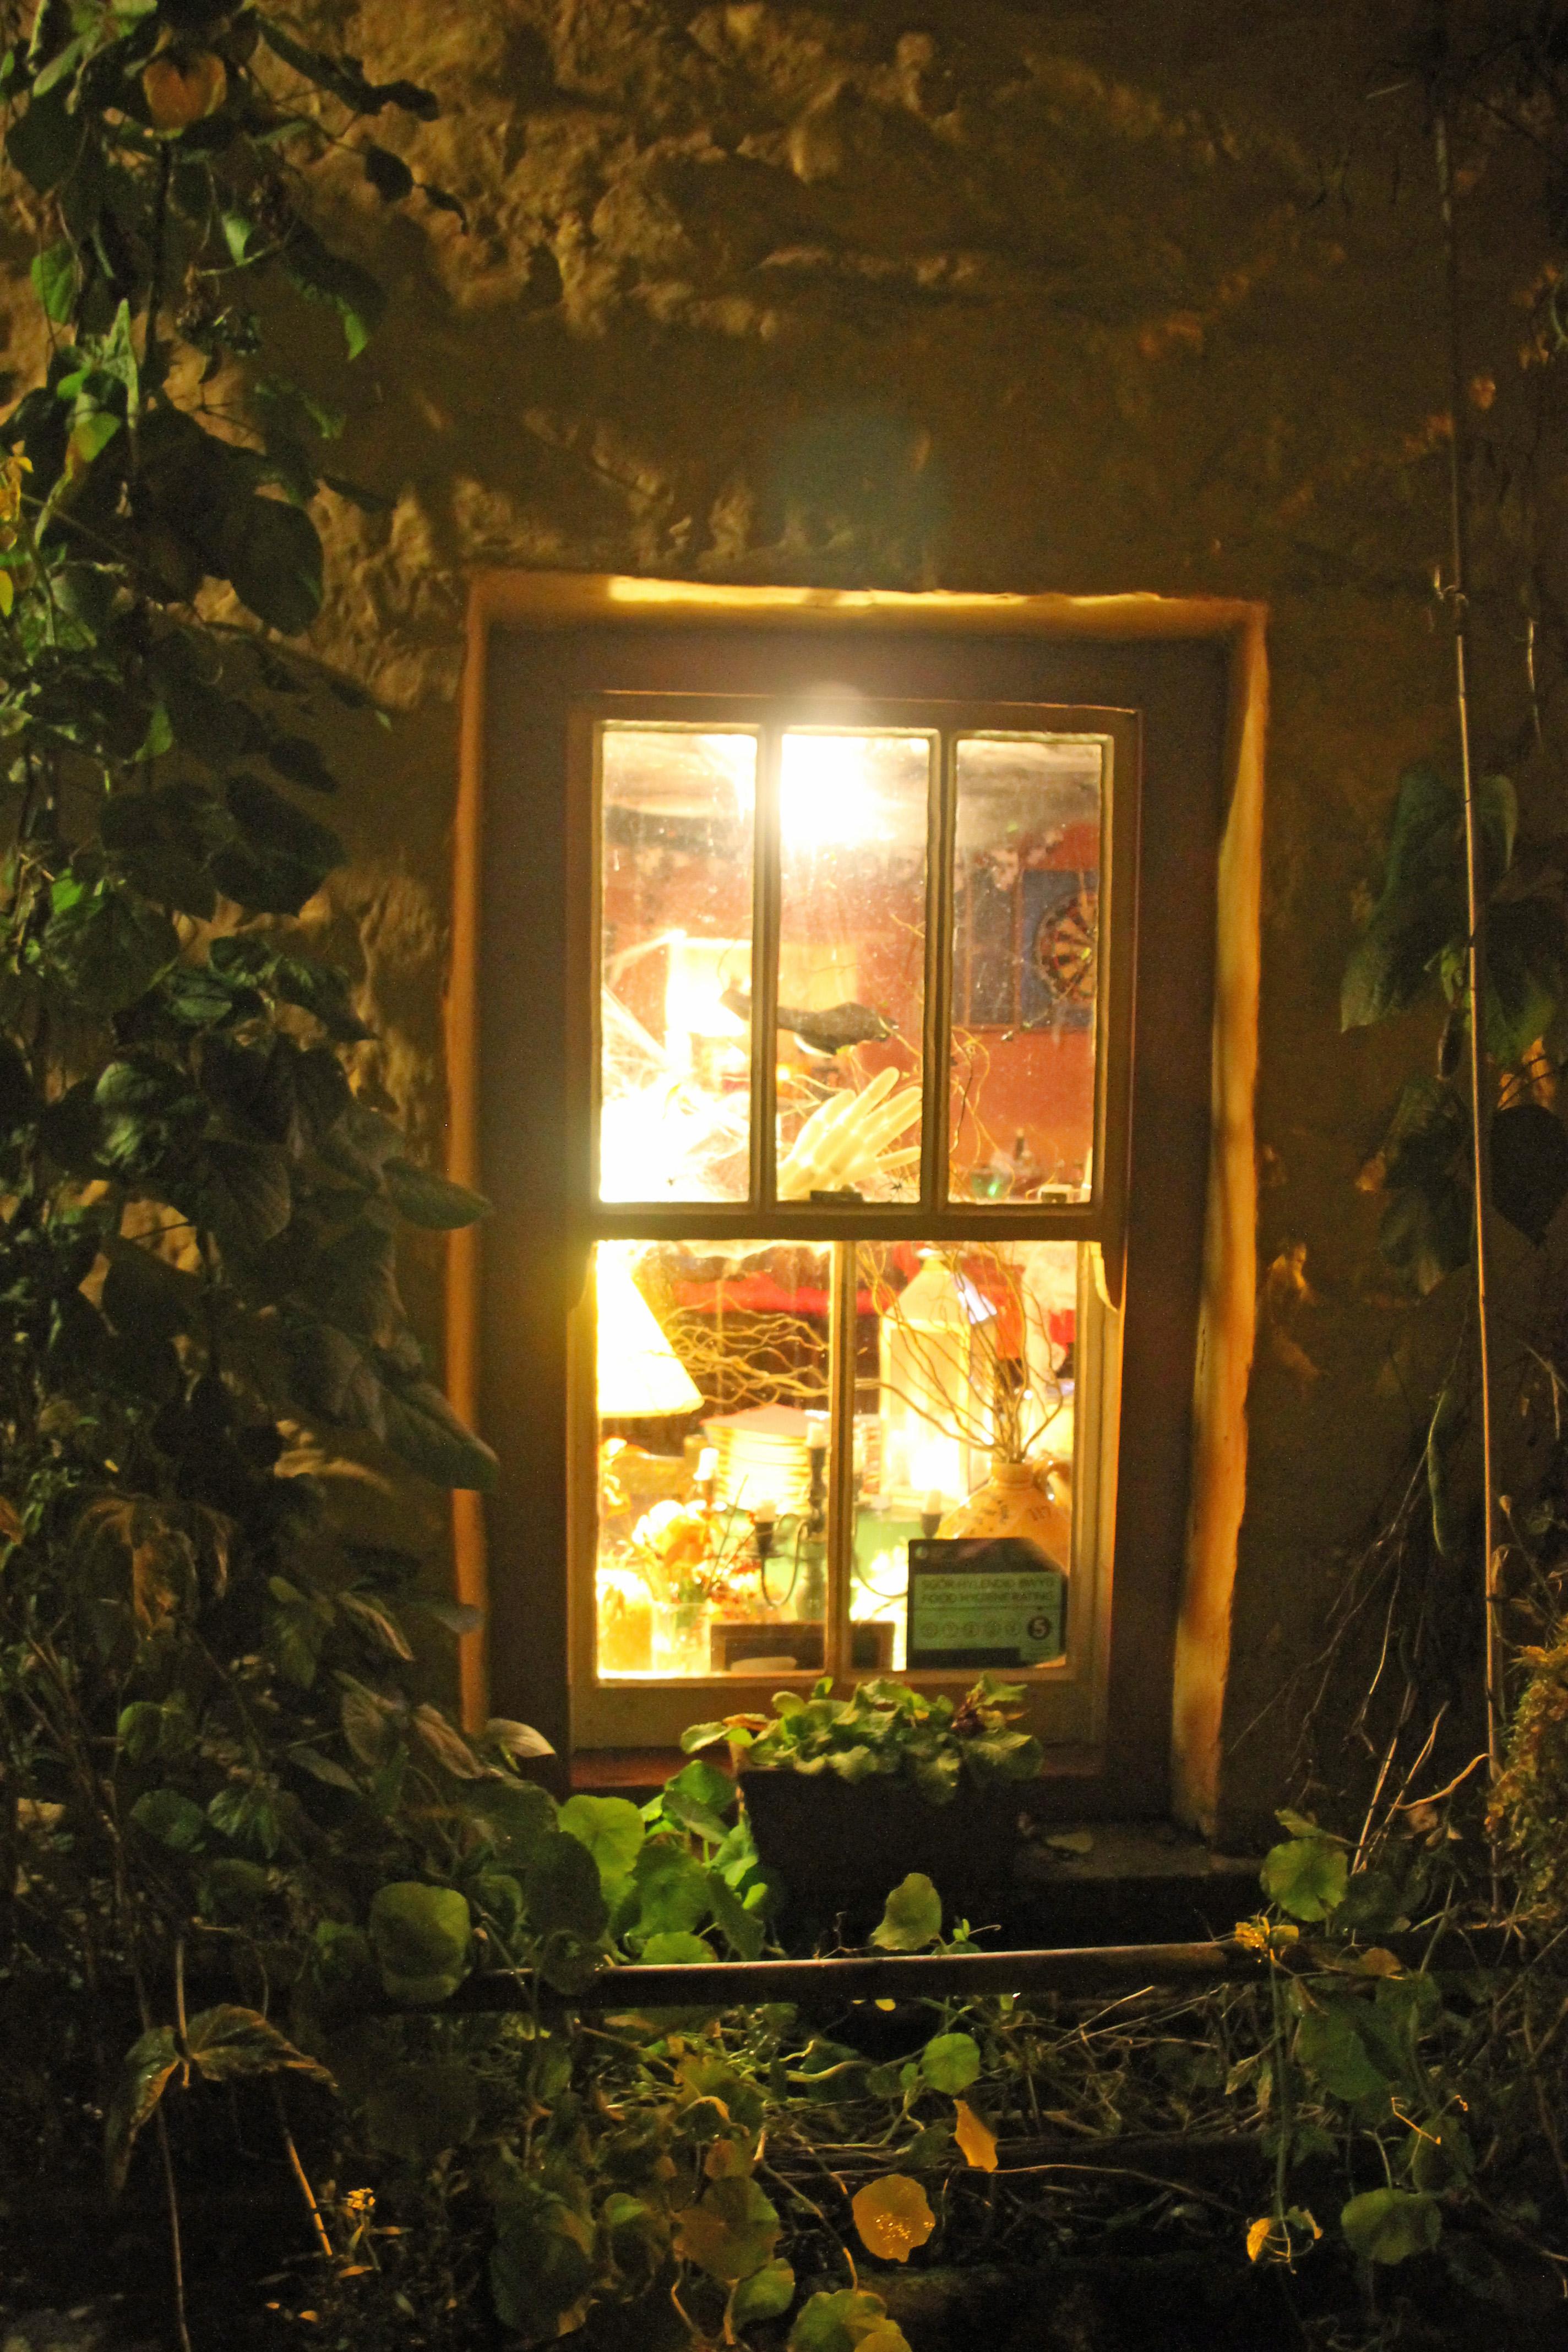 IMG_3501 Through the Cwmdu Inn window on Halloween